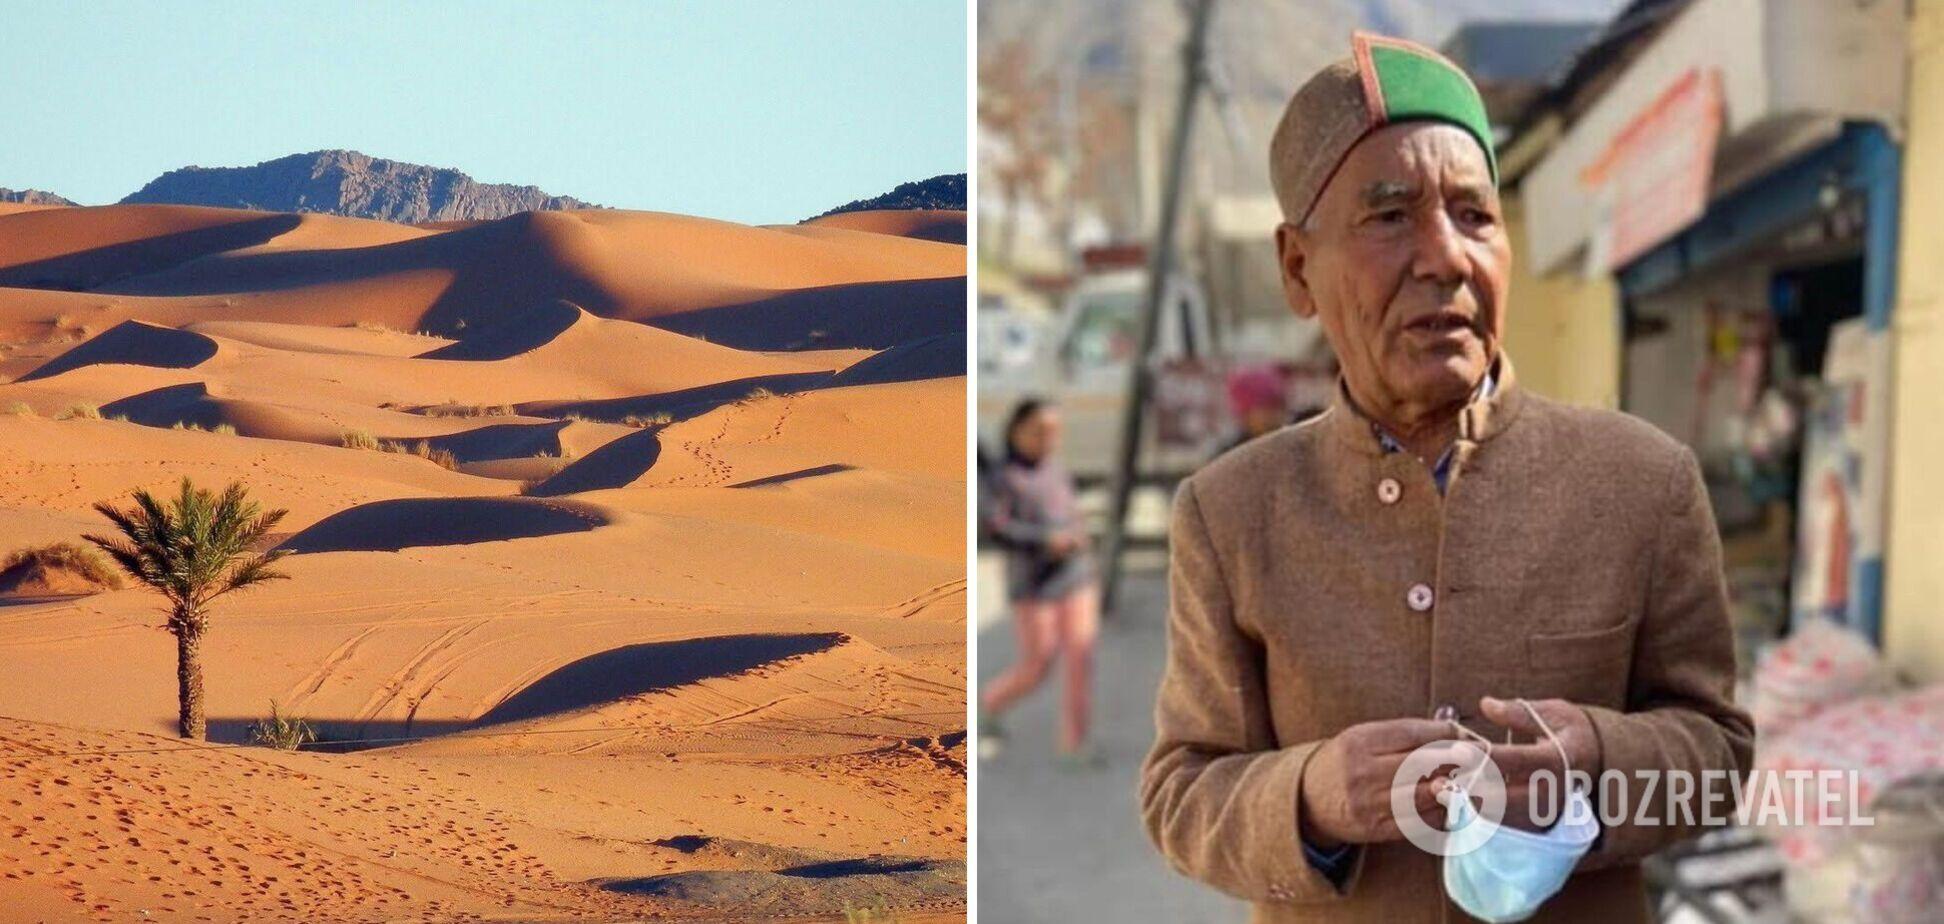 Умер мужчина, превративший пустыню в Индии в оазис